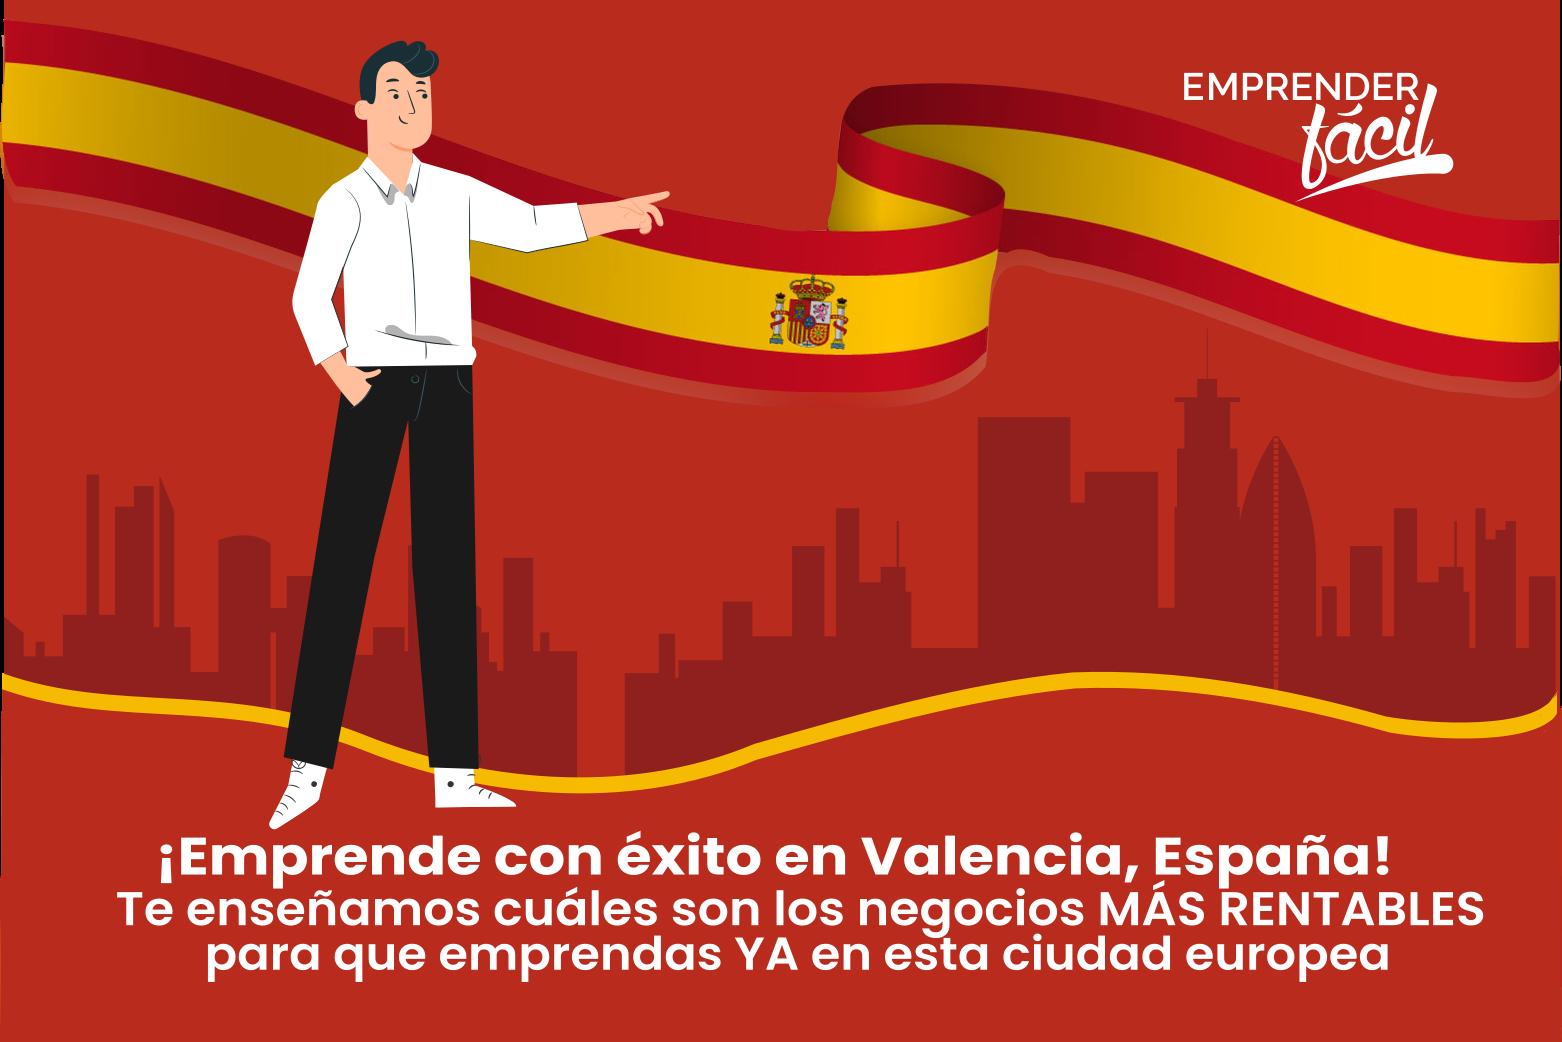 Negocios rentables en Valencia, España ¡Perfecto!